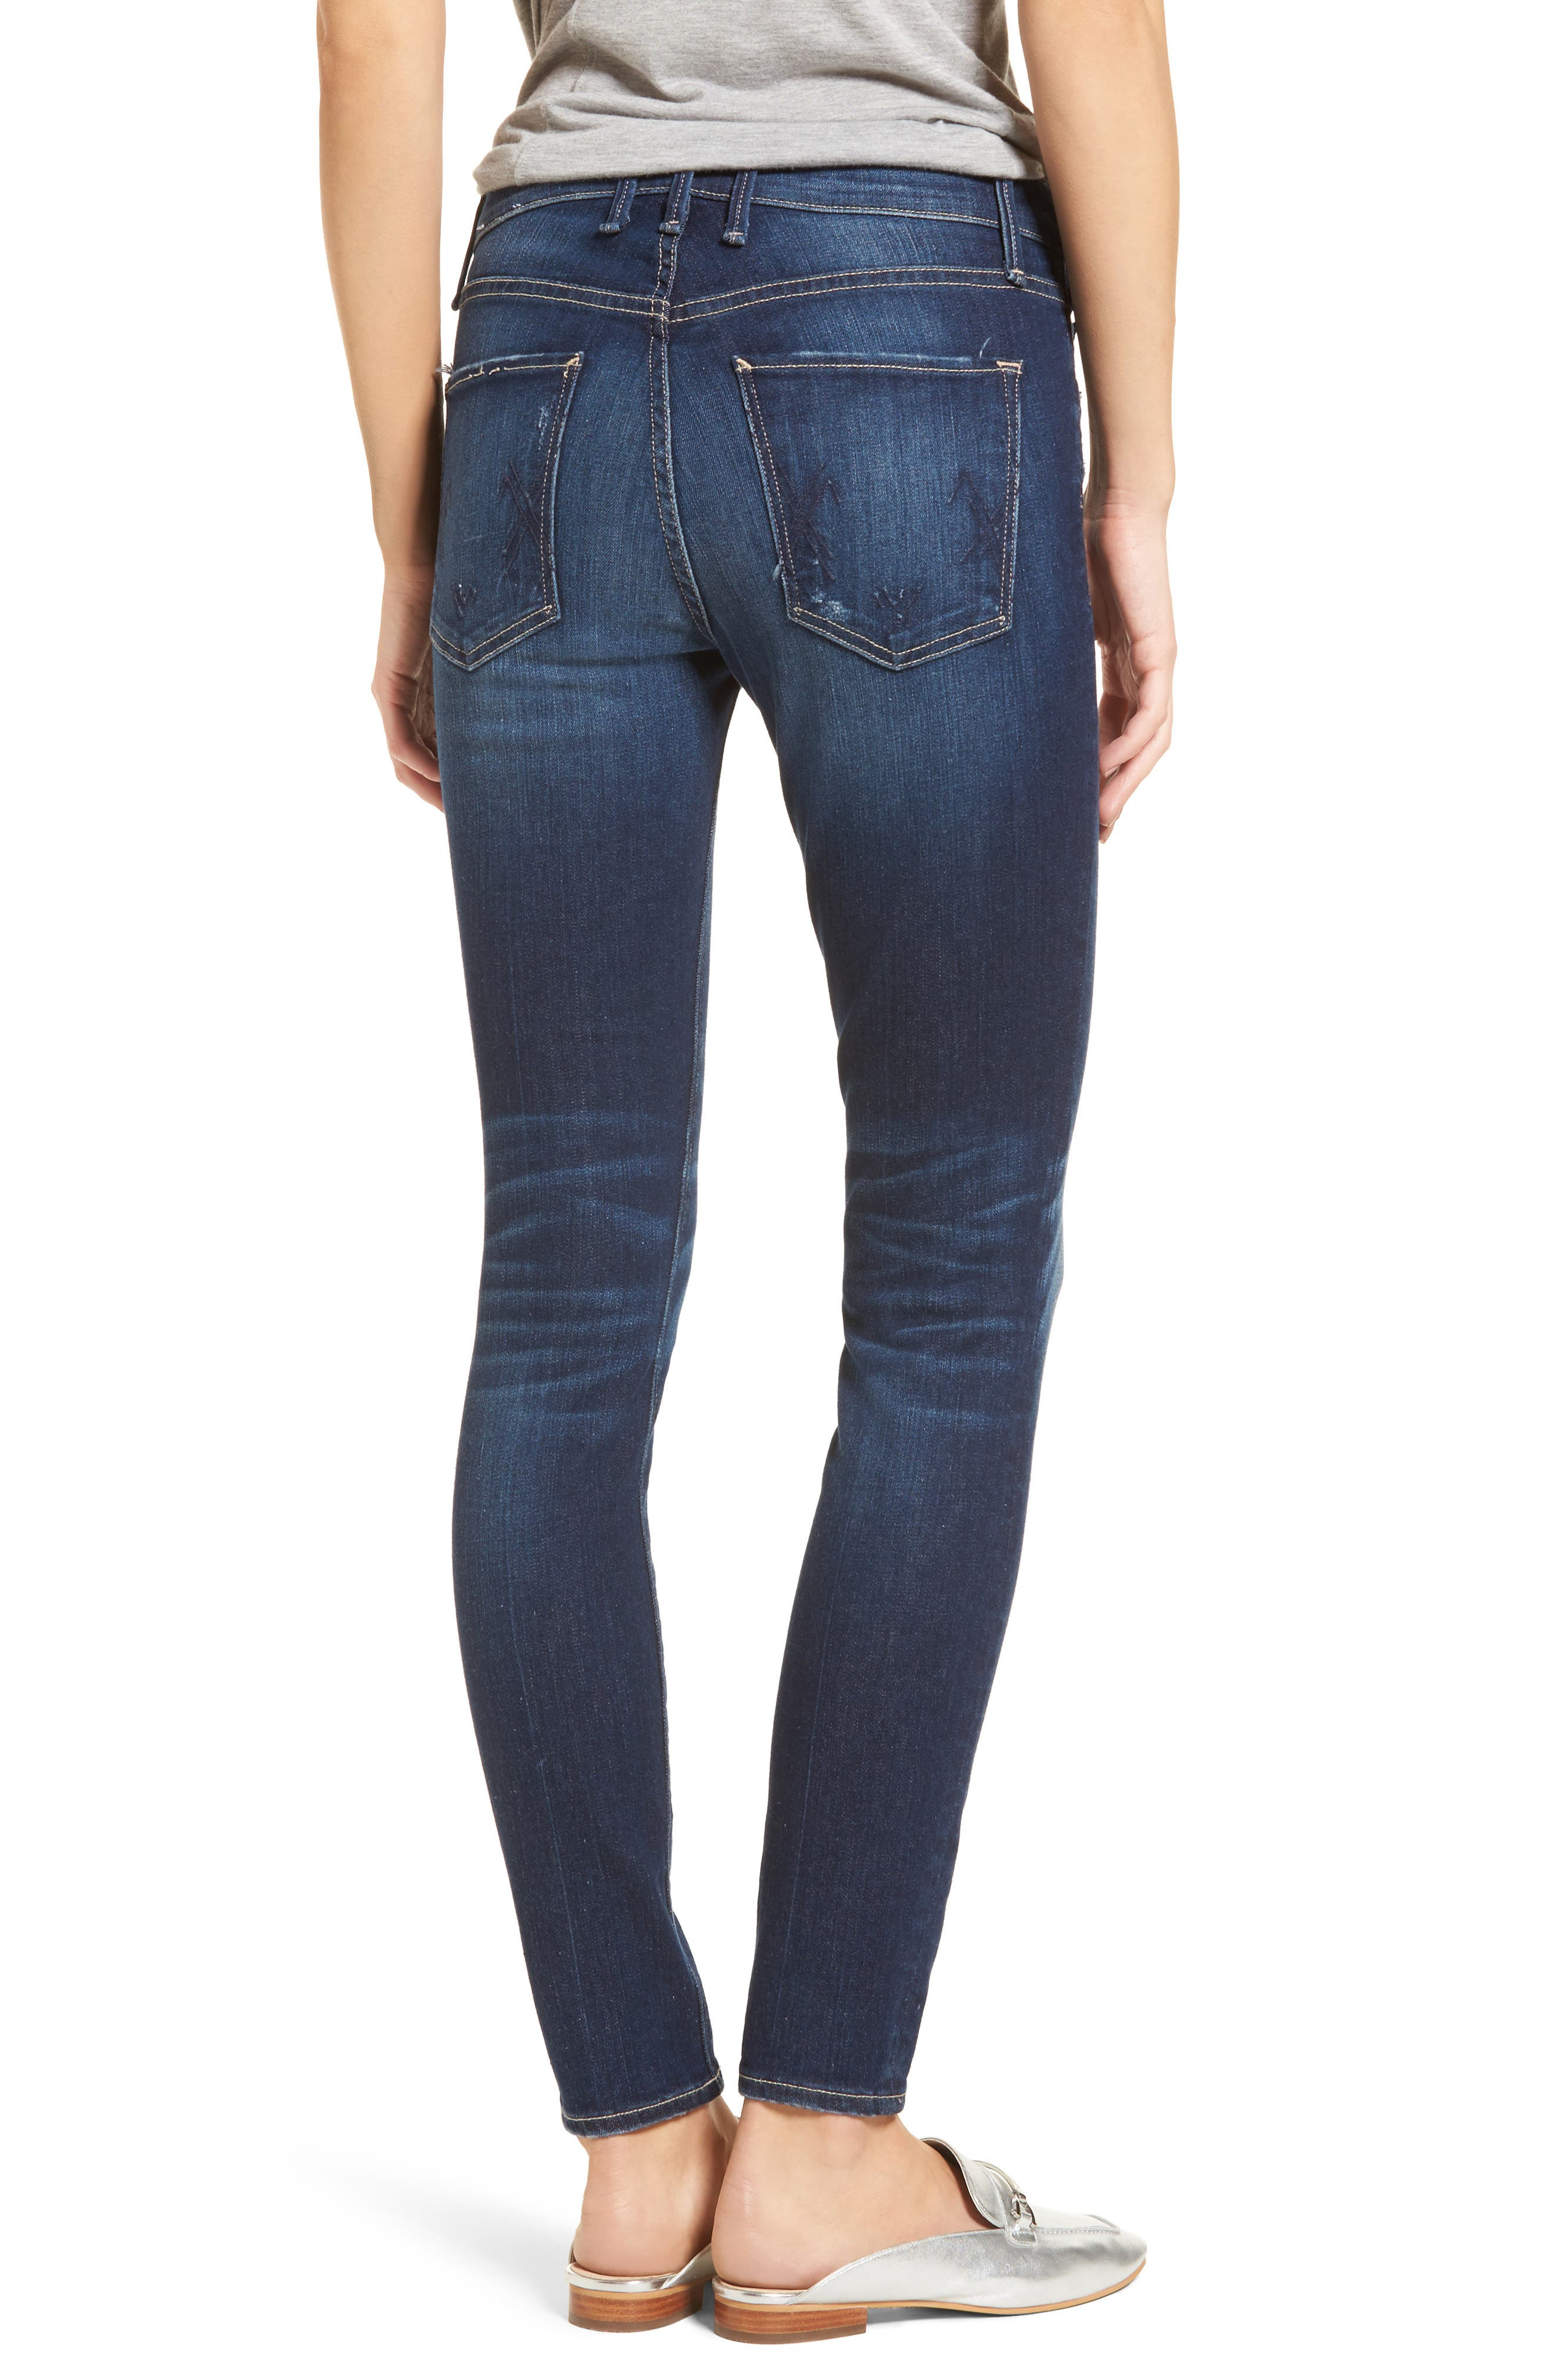 Newton Skinny Jeans,                             Alternate thumbnail 2, color,                             Chateau